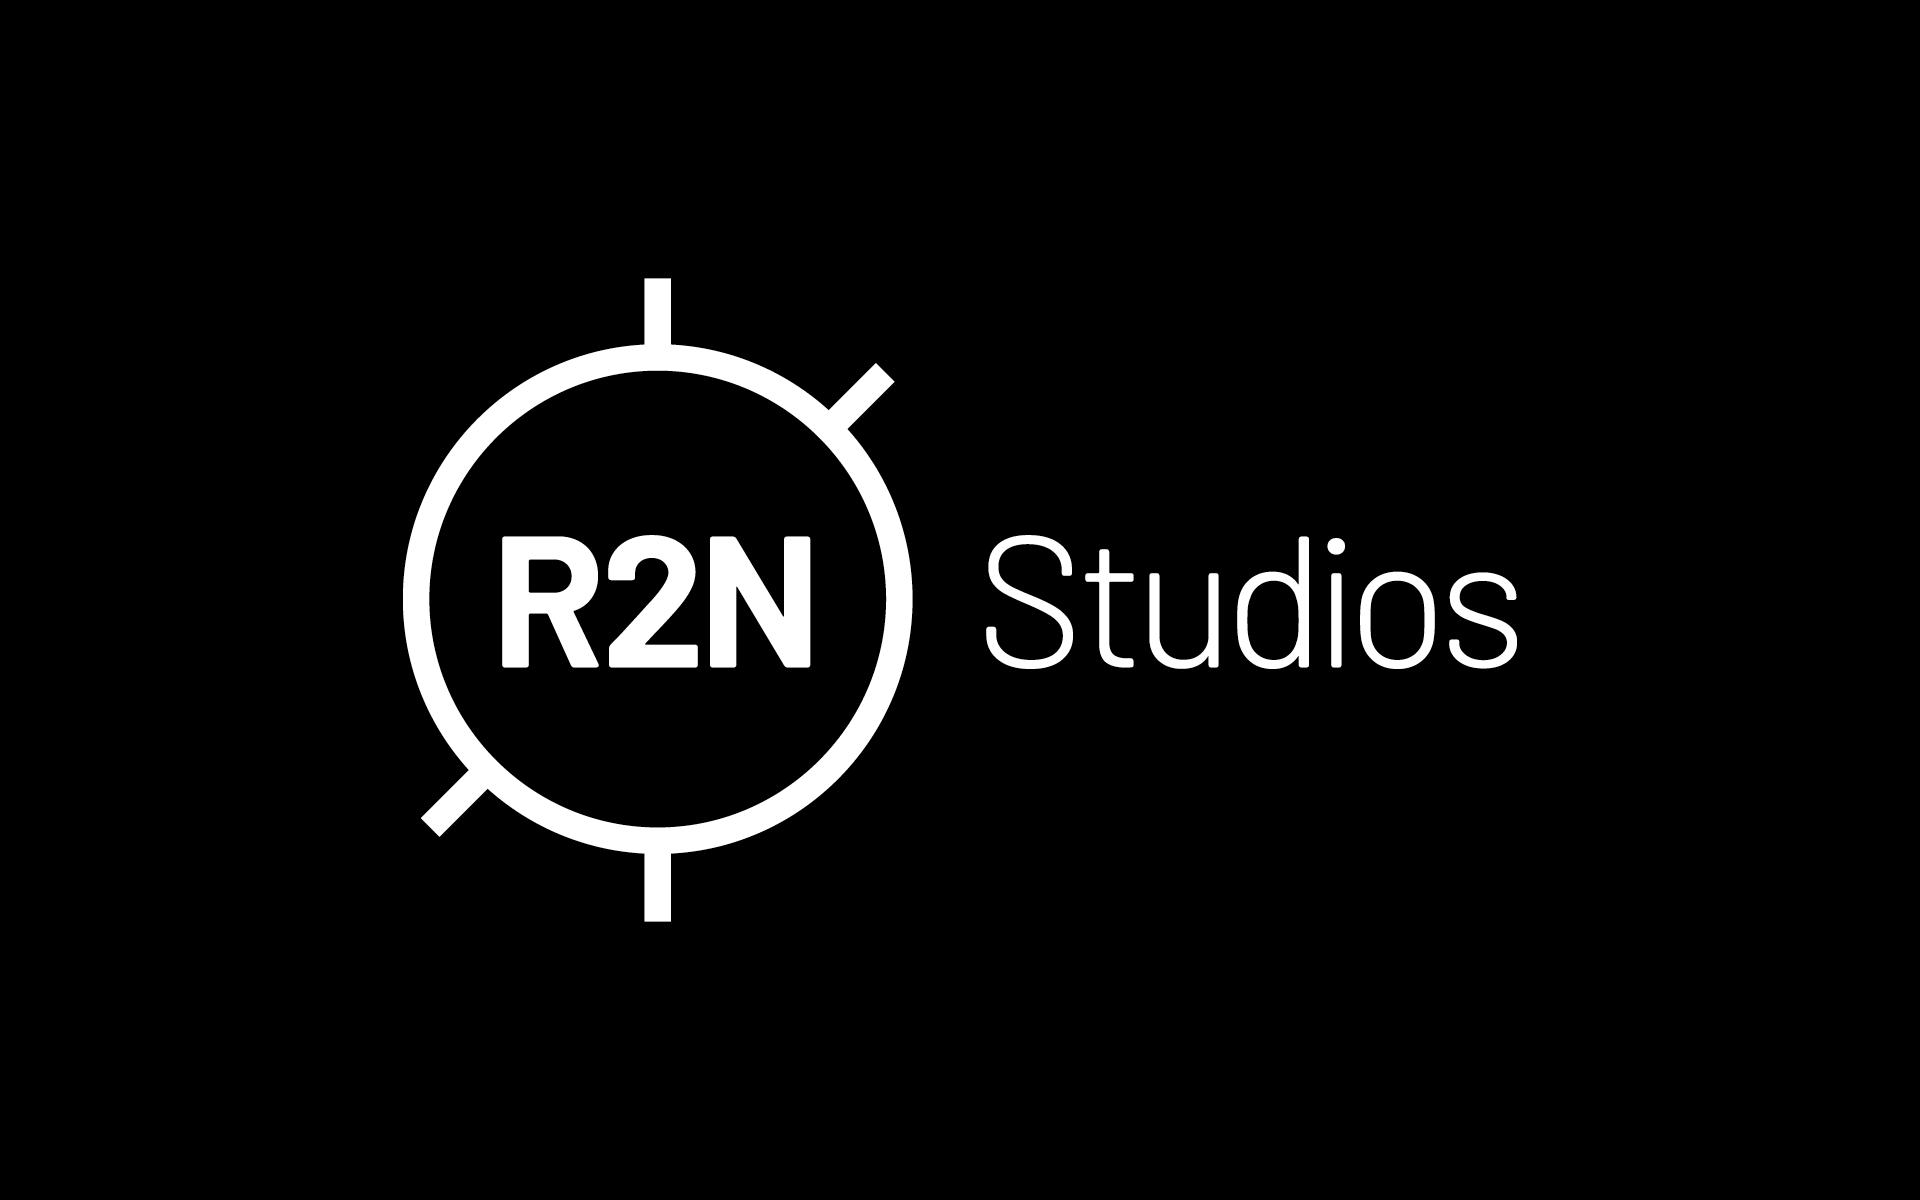 DSP R2N Studios 1